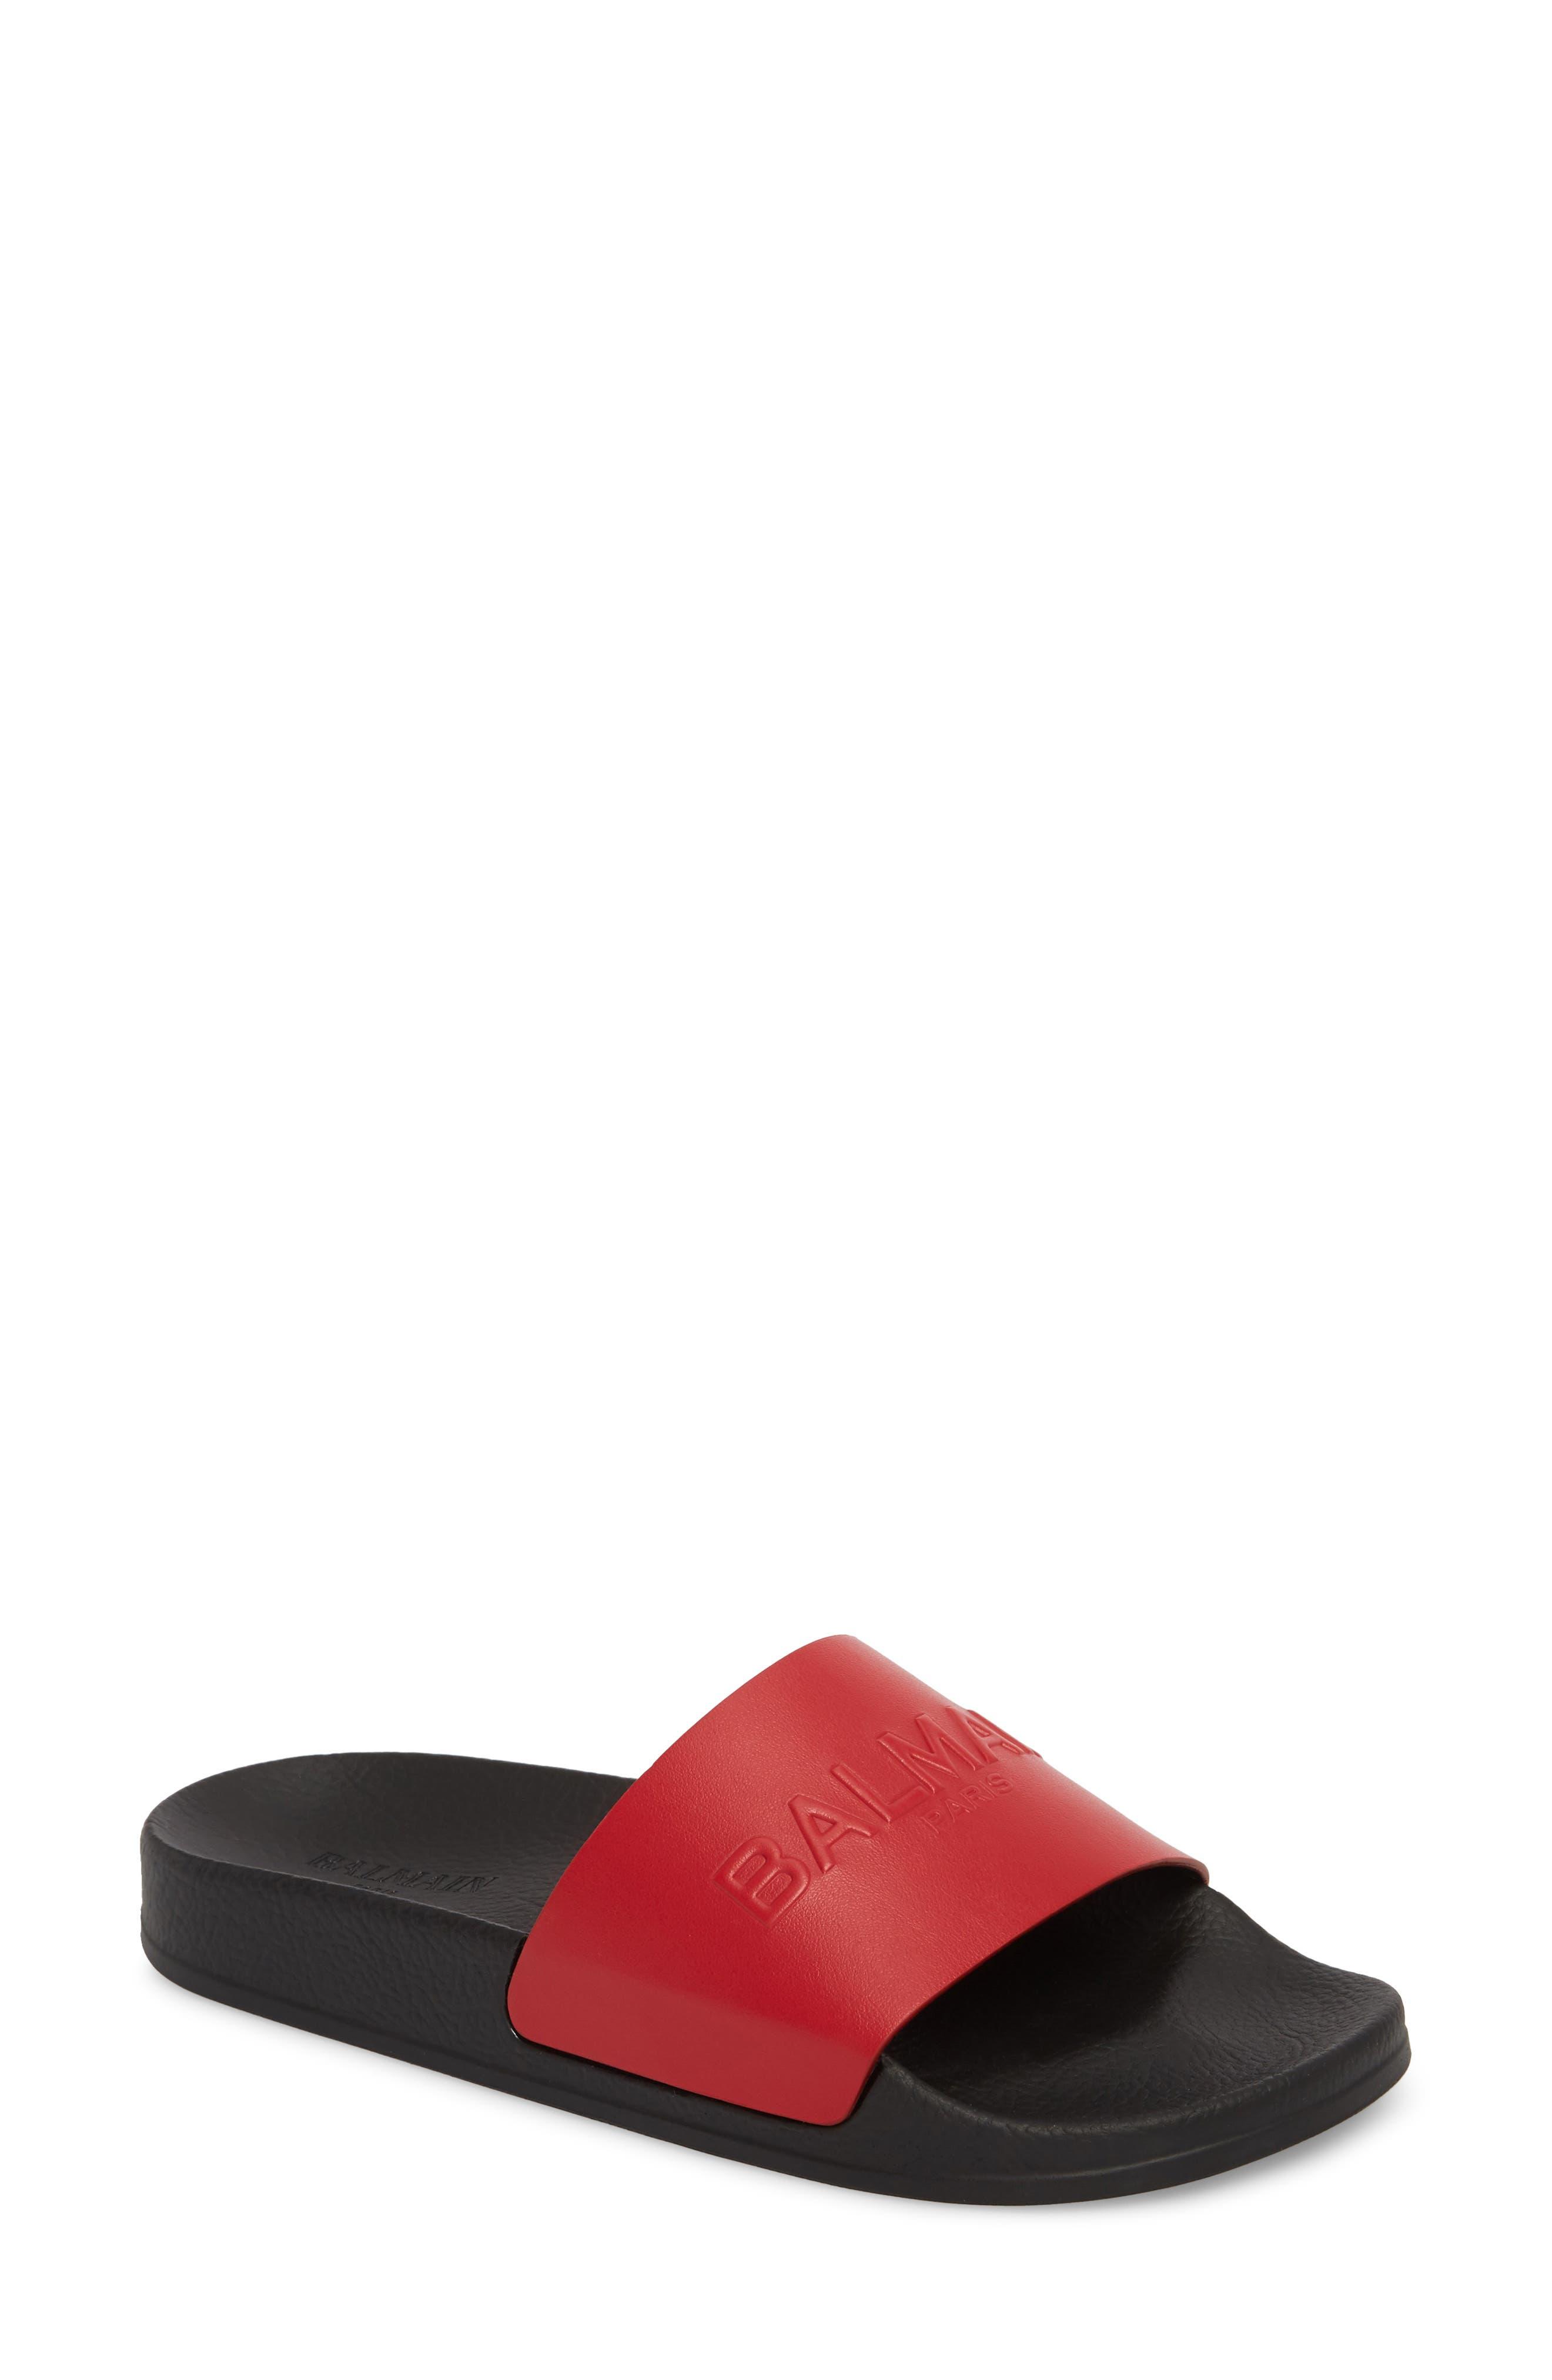 Alternate Image 1 Selected - Balmain Calypso Logo Strap Slide Sandal (Women)